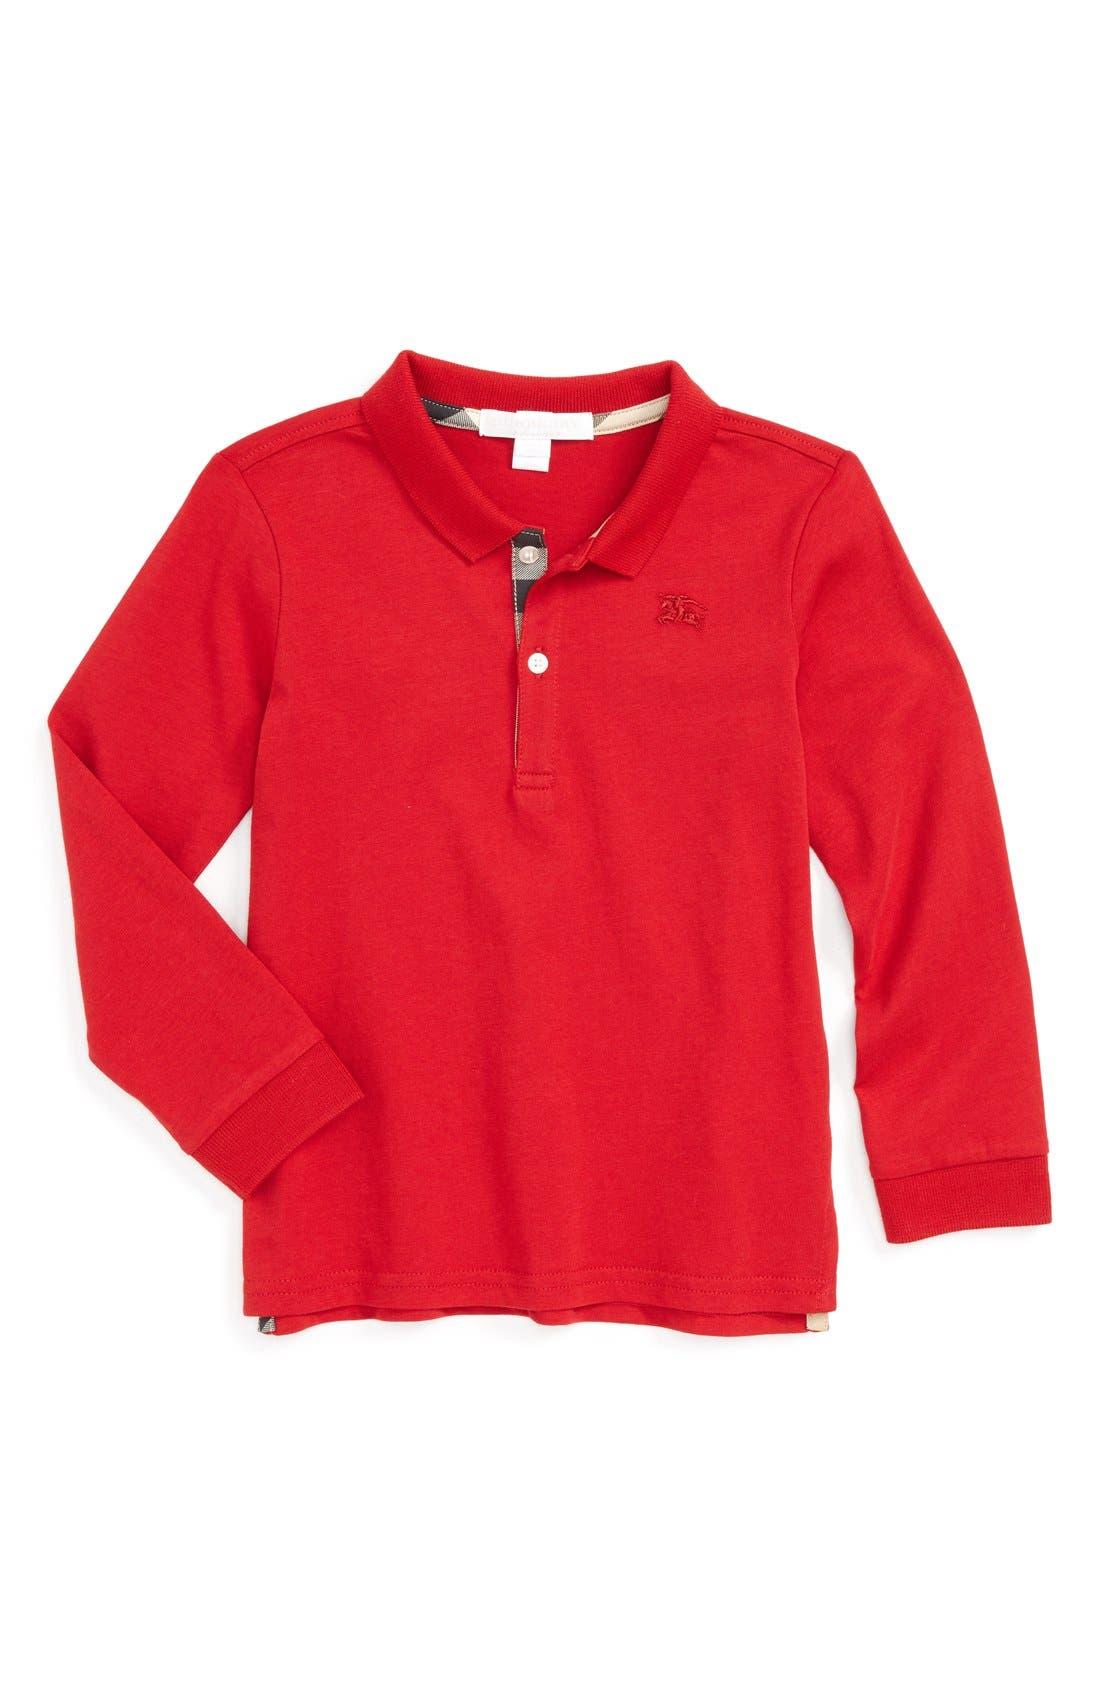 Alternate Image 1 Selected - Burberry 'Palmer' Long Sleeve Polo (Toddler Boys)